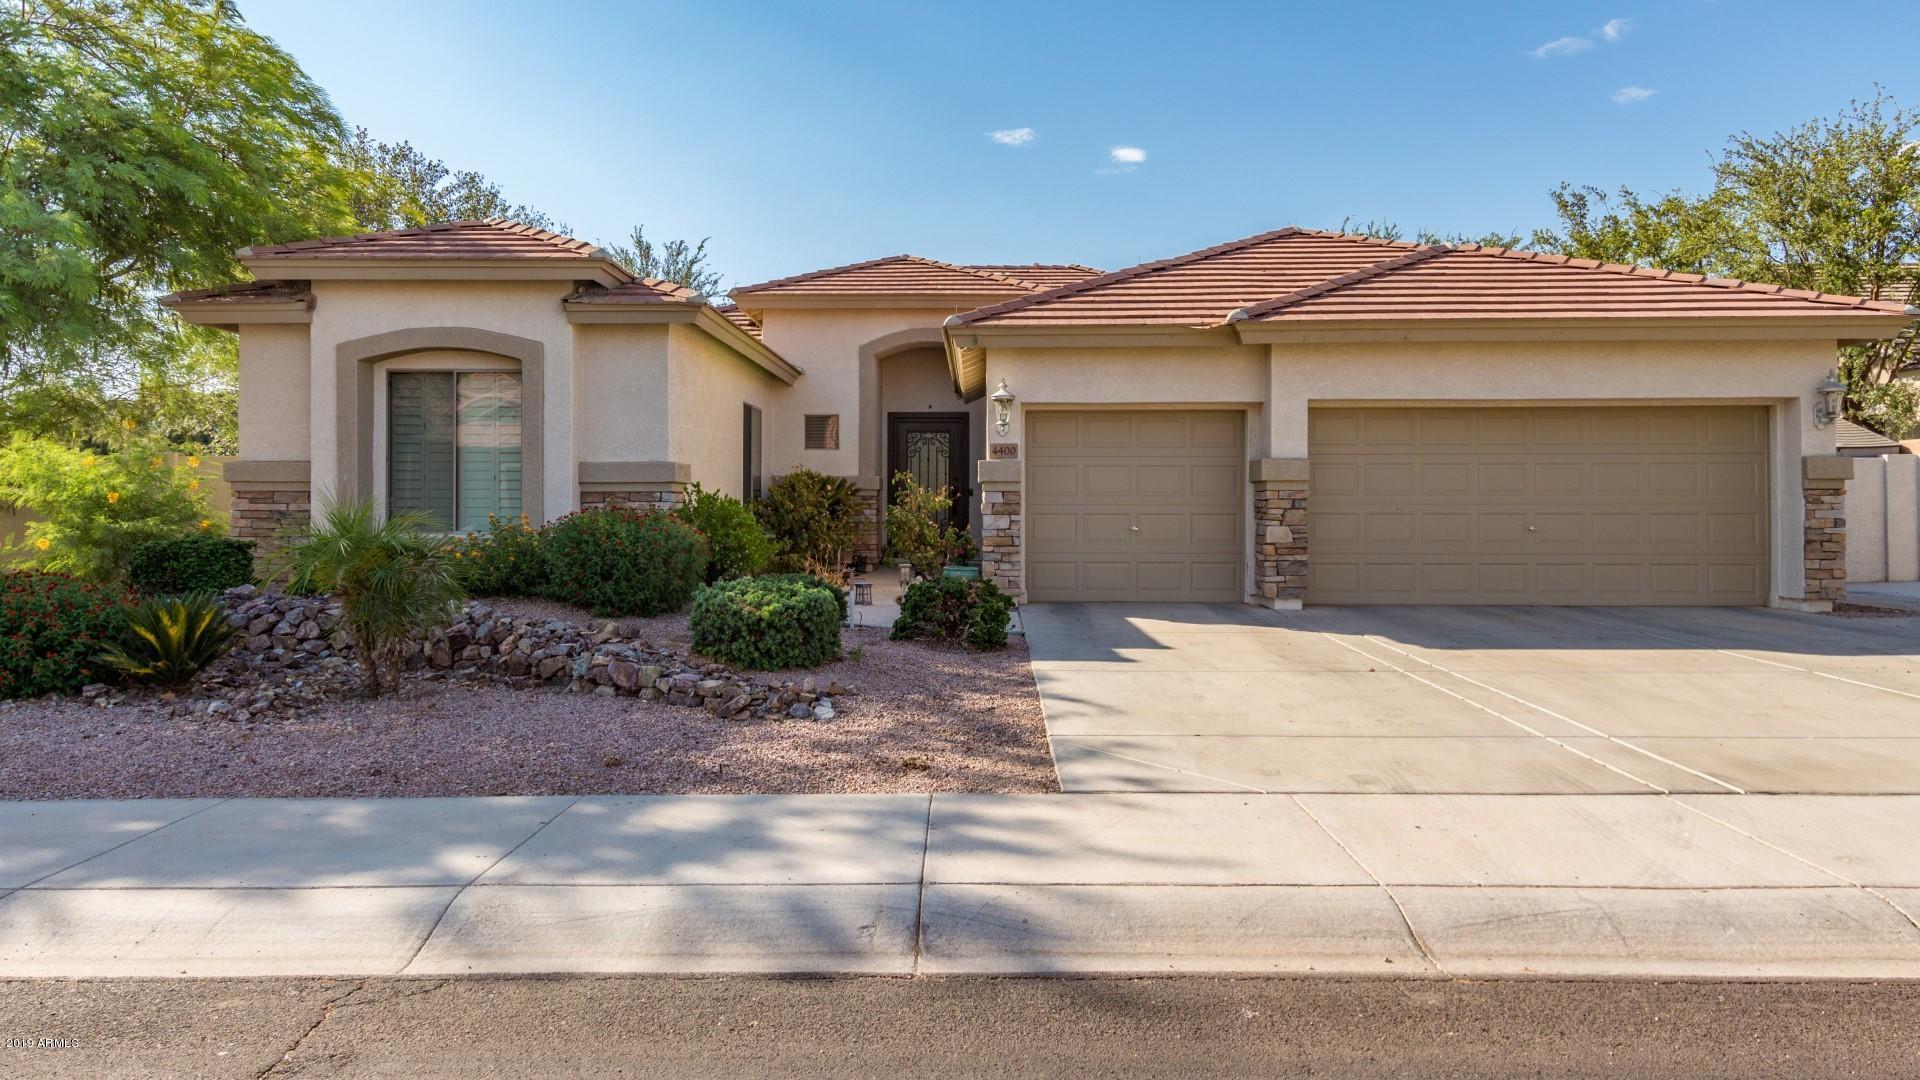 Photo of 4400 E RIDGEWOOD Lane, Gilbert, AZ 85298